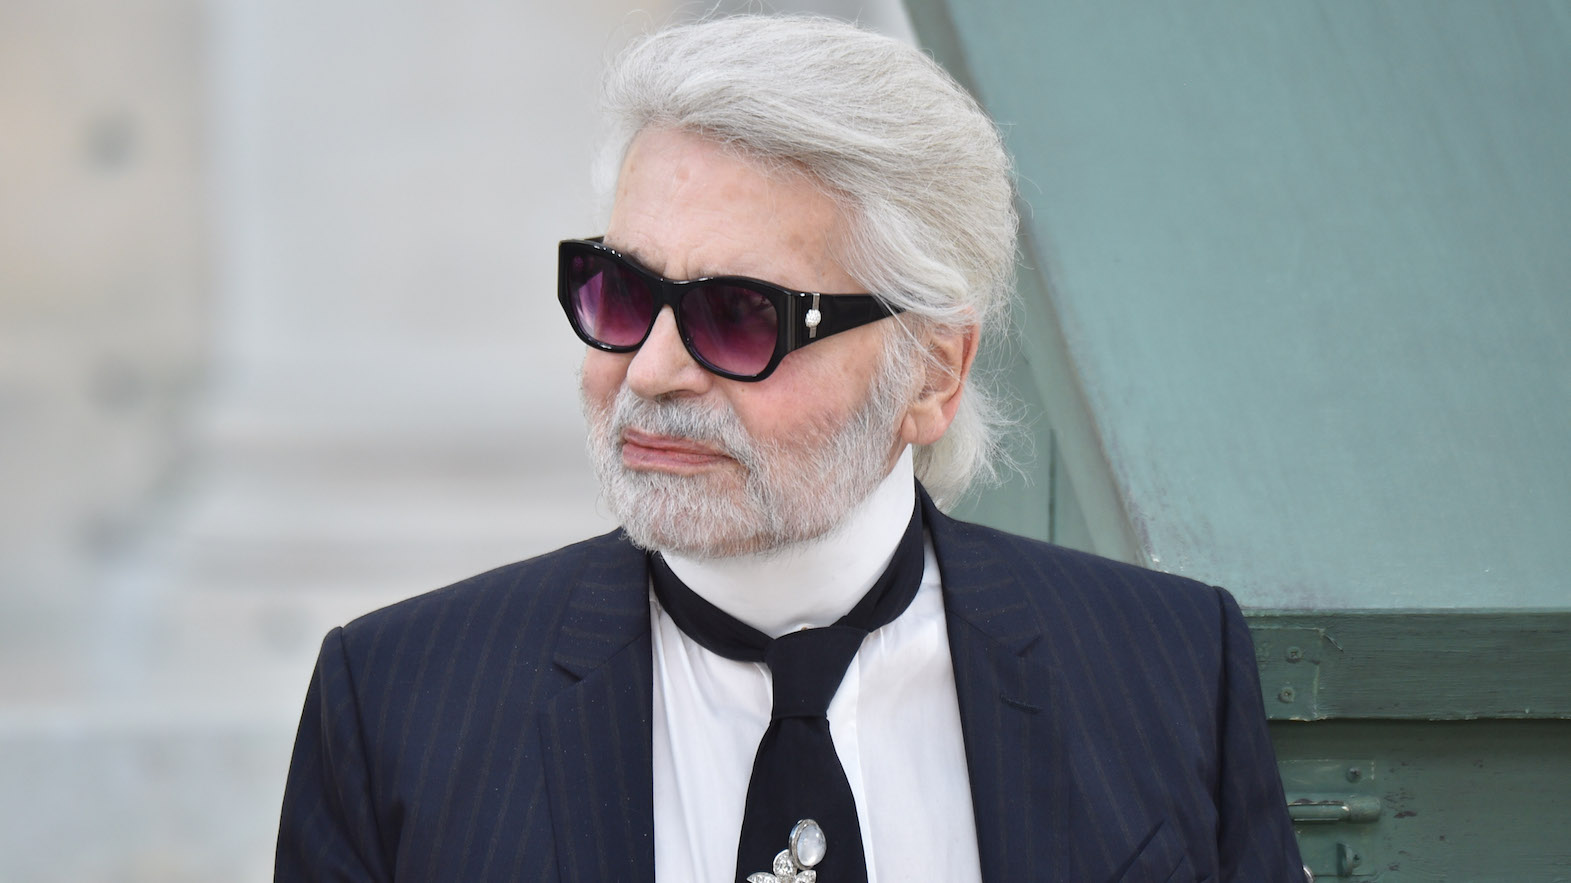 Chanel Fashion Designer Karl Lagerfeld Dies At 85 After Illness